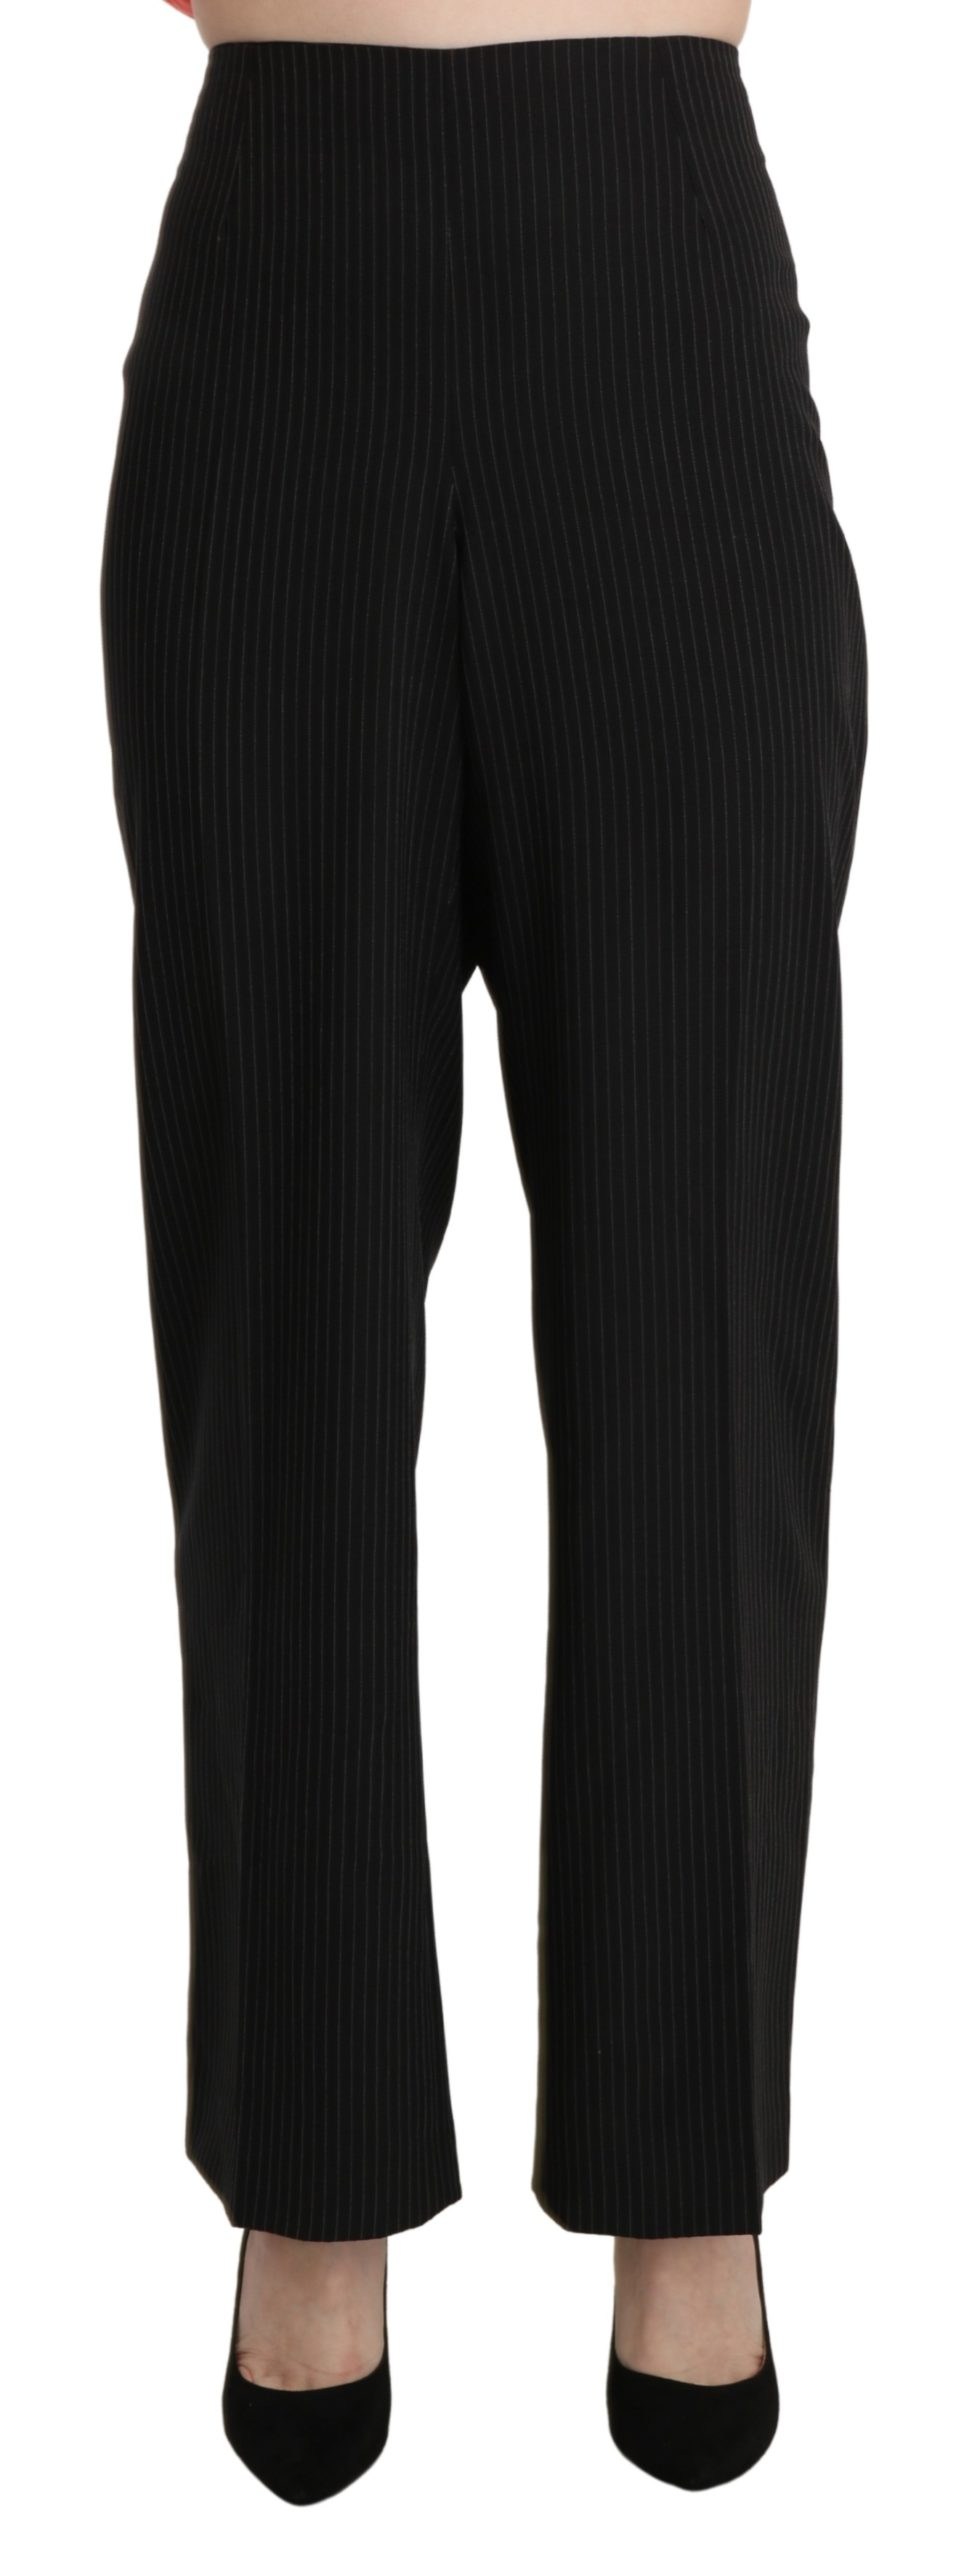 BENCIVENGA Women's High Waist Straight Trouser Black PAN71340-52 - IT52   XL